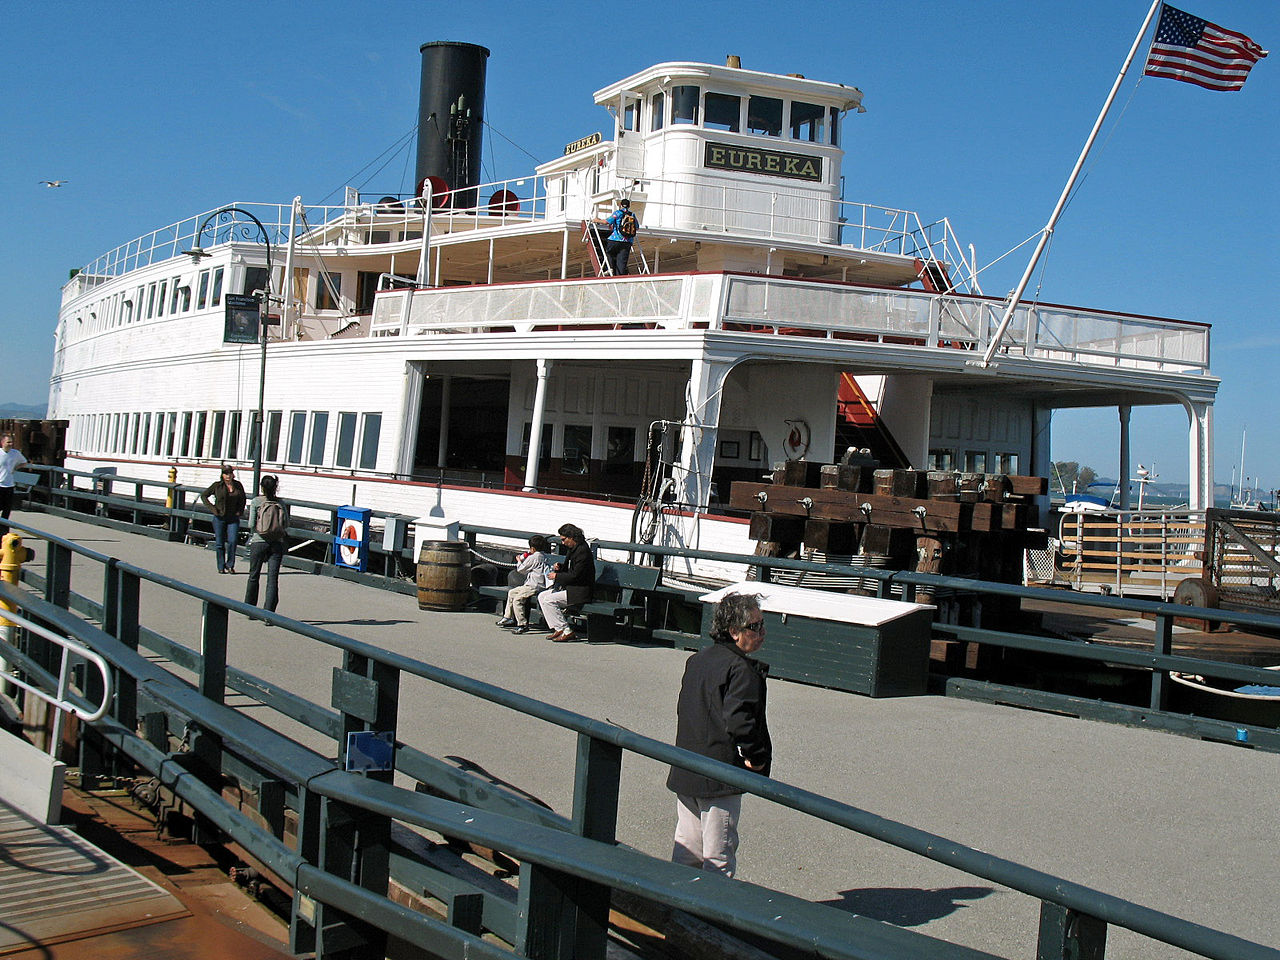 1280px-Eureka_(steam_ferryboat,_San_Francisco).jpg